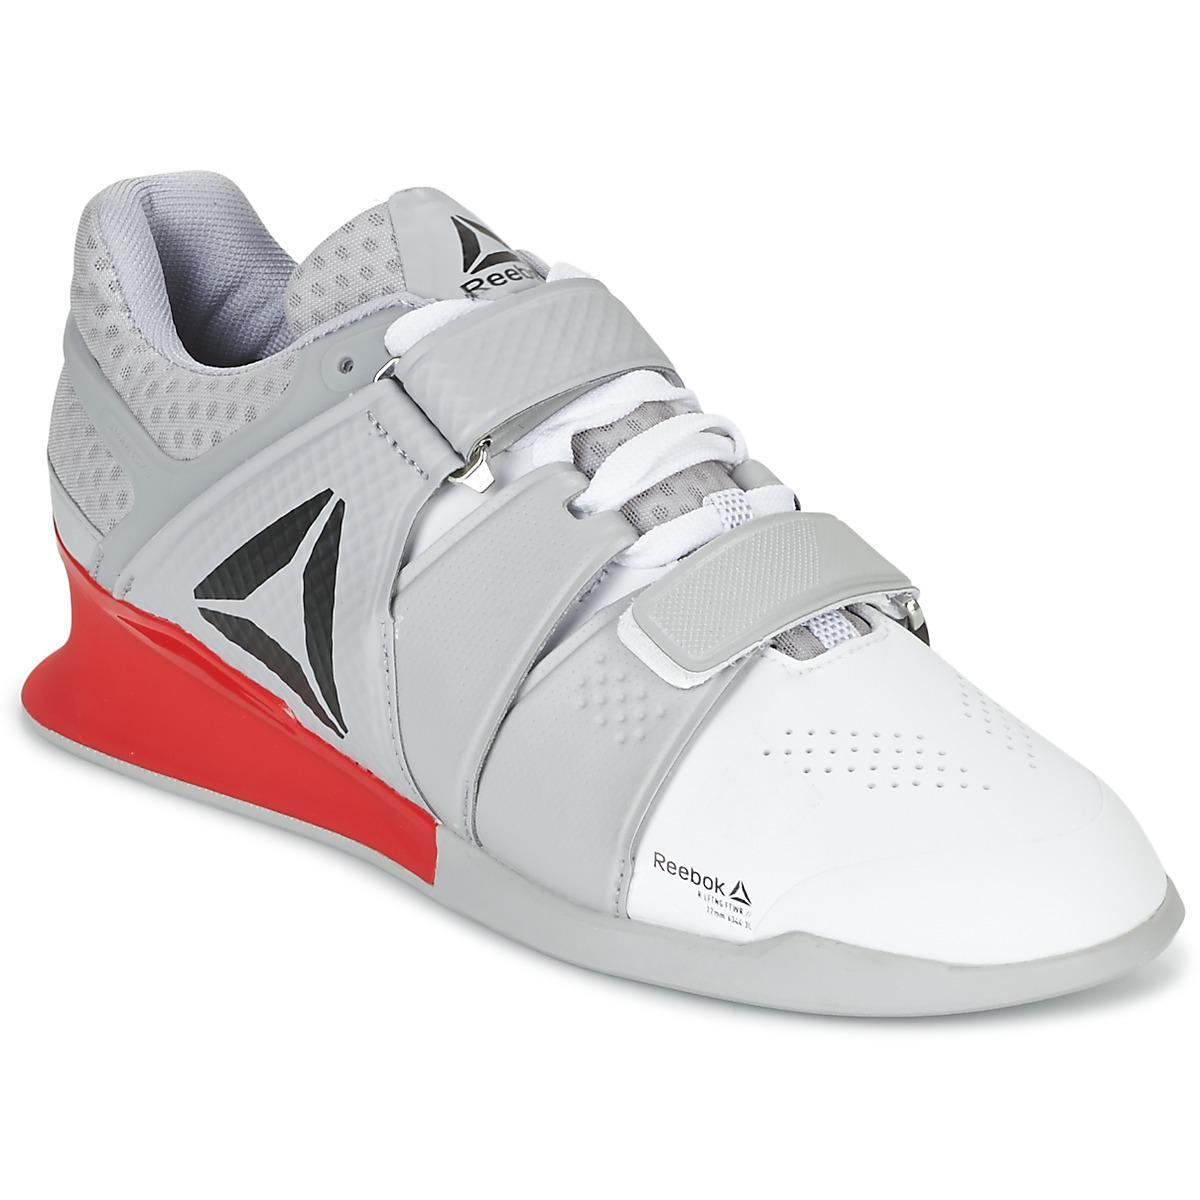 Reebok Legacylifter Crossfit Men s Trainers In Grey in Gray for Men ... 2571e6cd7